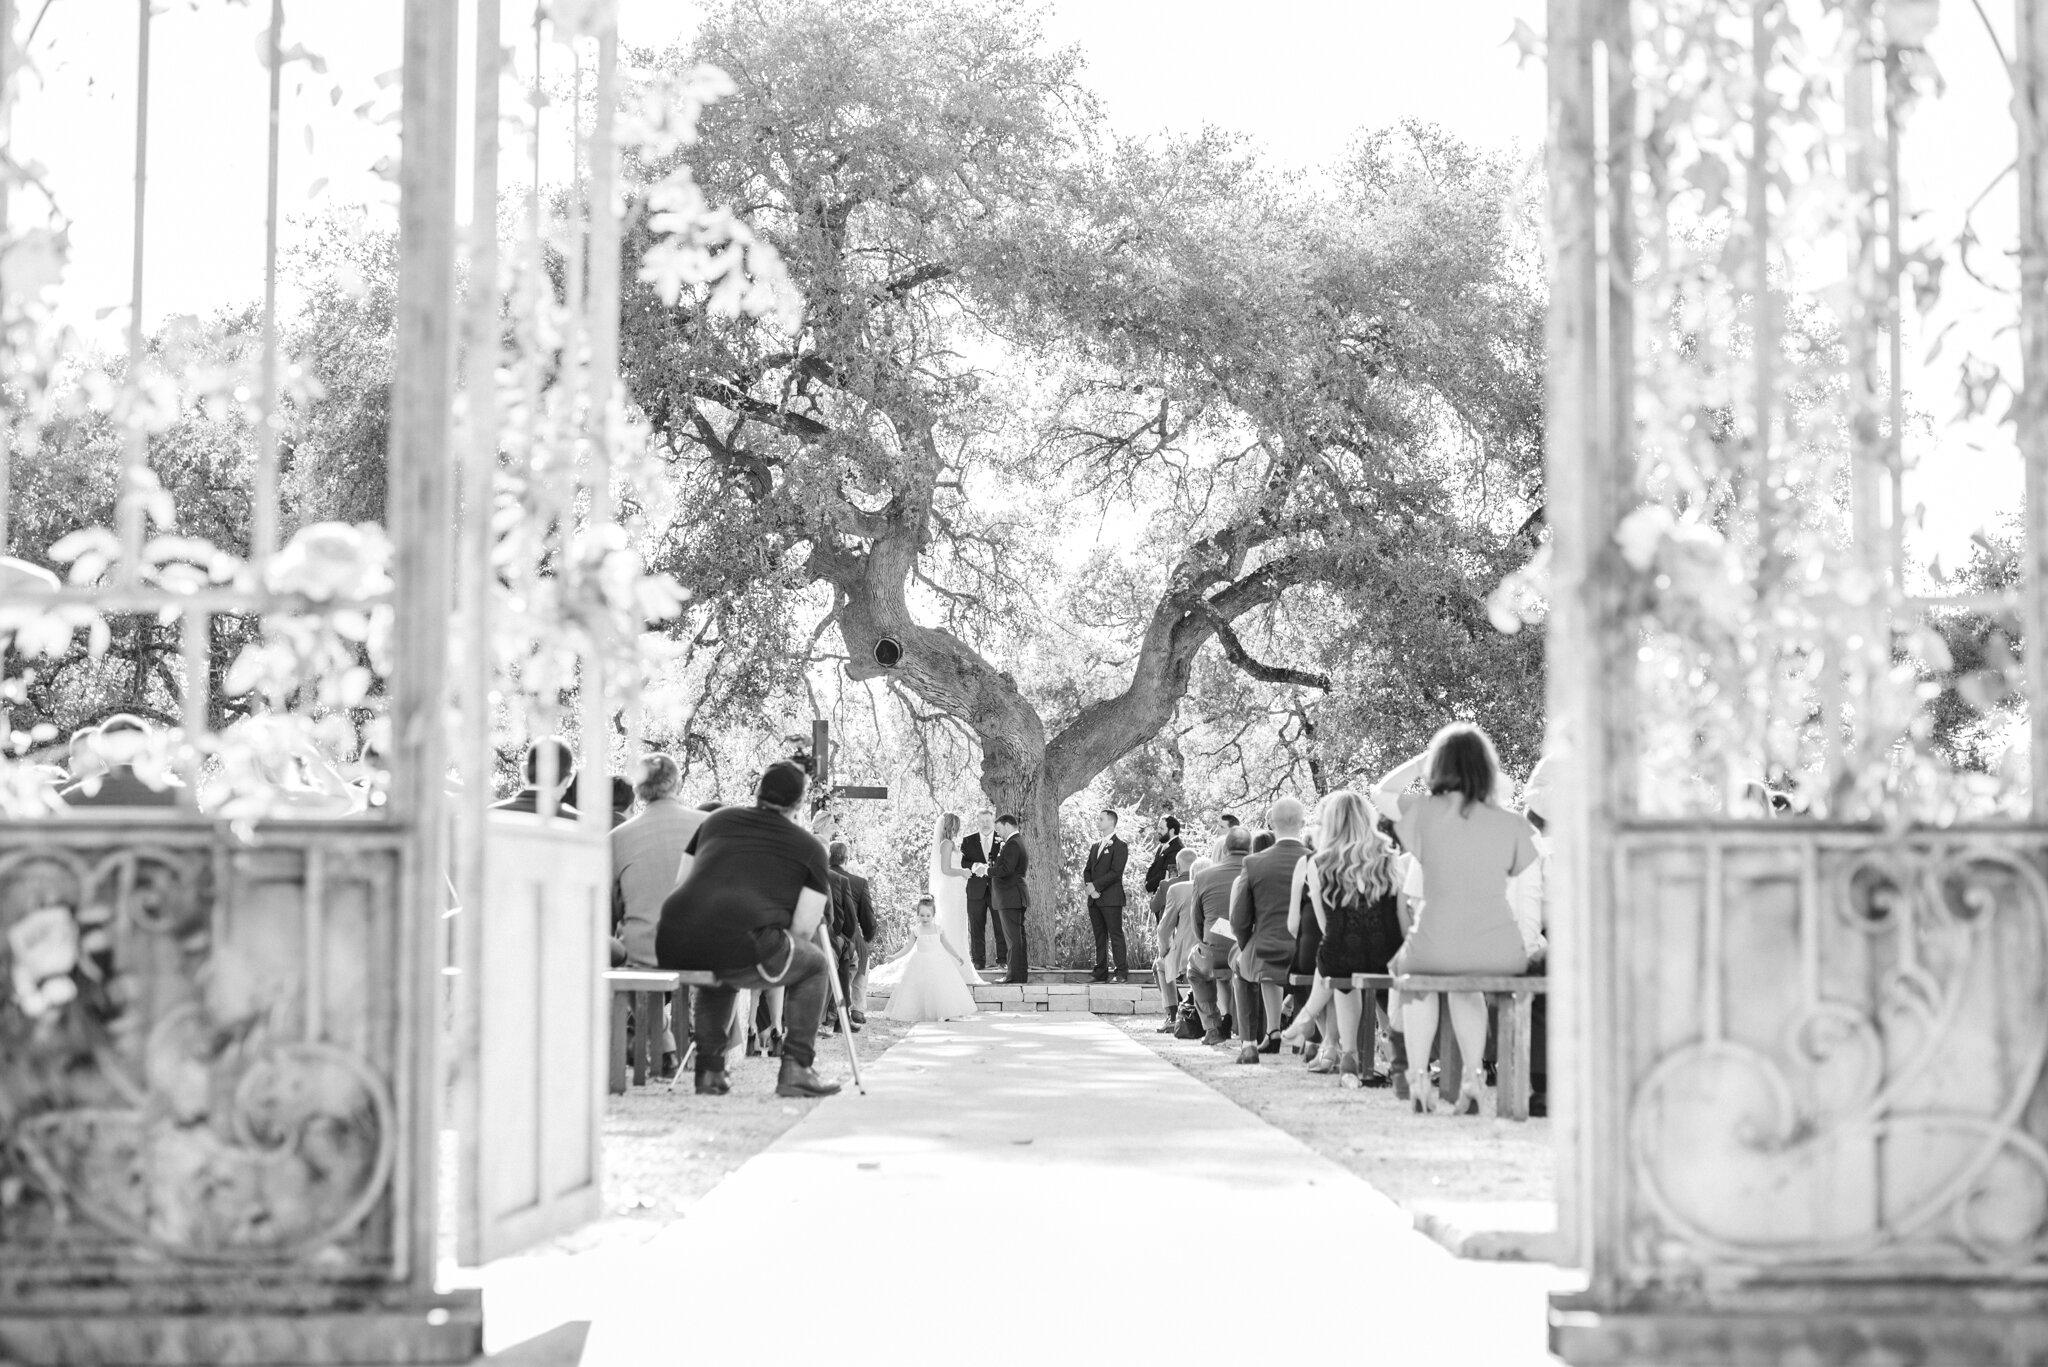 San Antonio Austin Boerne New Braunfels Spring Branch Texas Wedding Engagement Photographer Photography Hill Country Texas Park 31 Wedding Summer Wedding Pink Navy Gold Elegant Chic Wedding San Antonio Austin Texas photographer 52